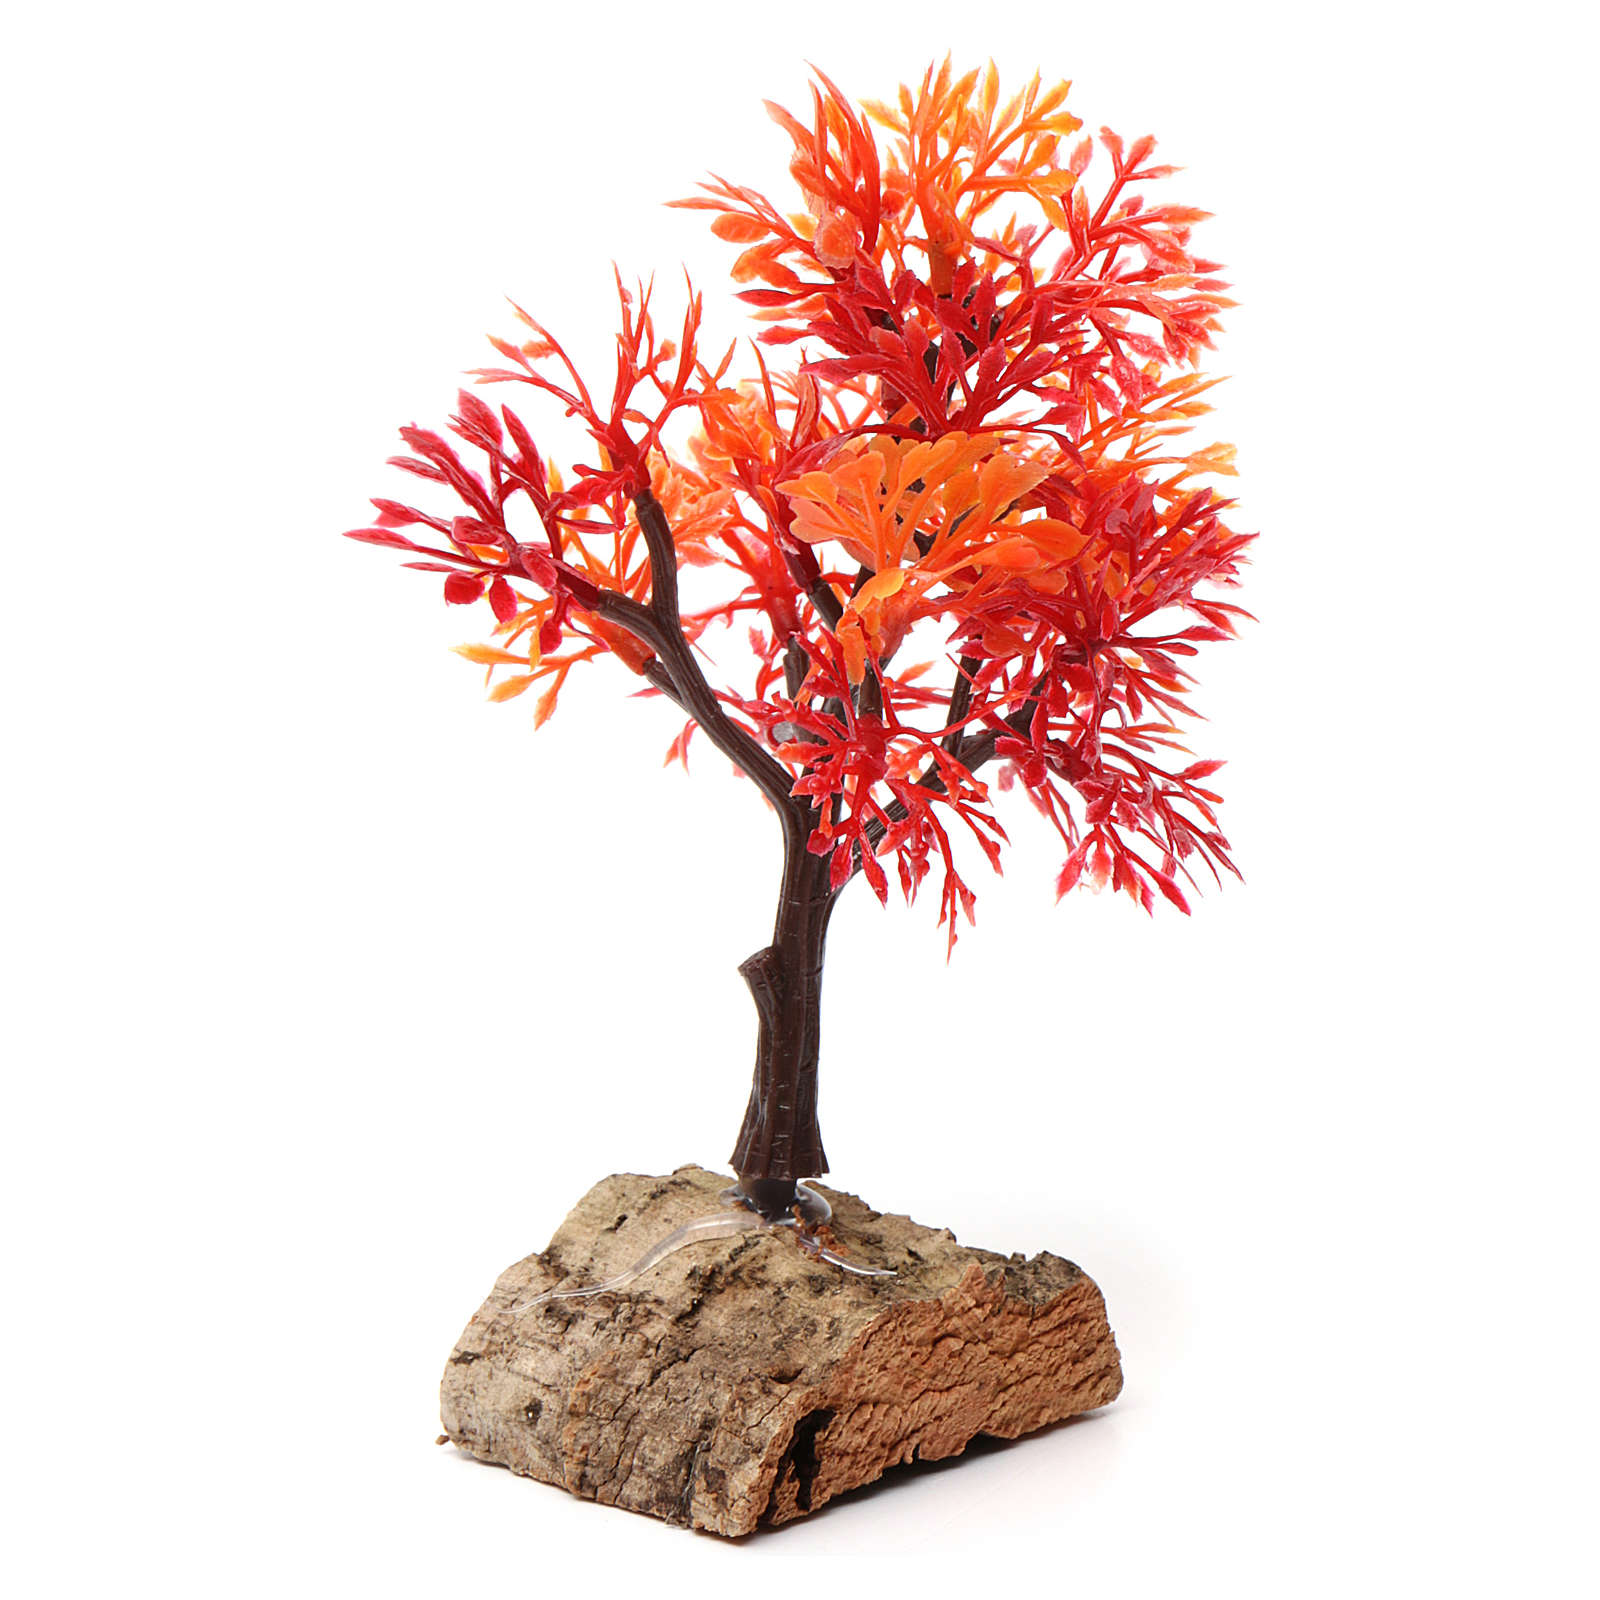 Autumn tree with cork base for Nativity Scene 7-10 cm 4